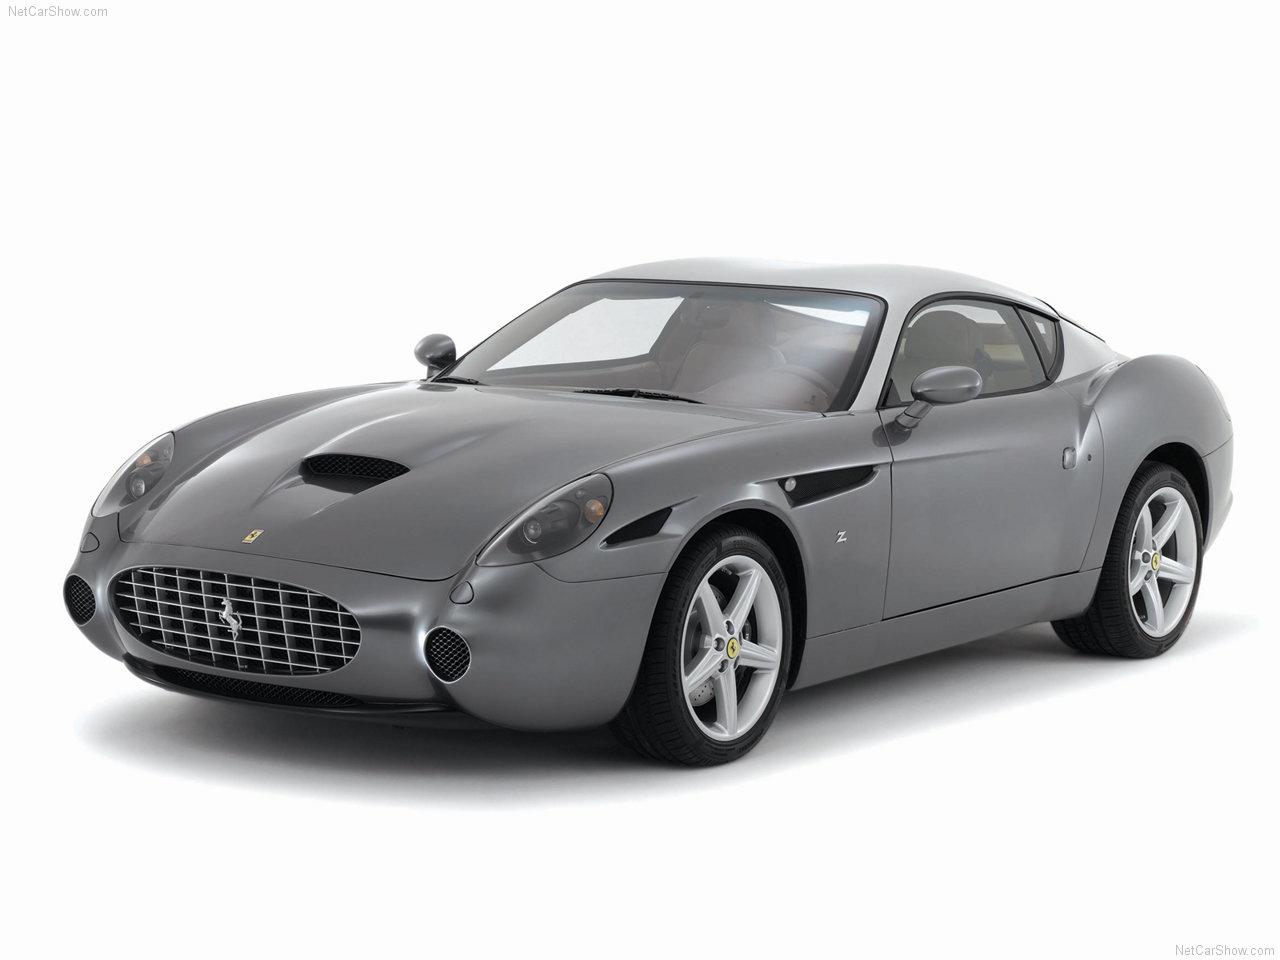 http://2.bp.blogspot.com/-Ks161ZWbuFI/TYh_nn6tiEI/AAAAAAAACSY/_a94NnVaayo/s1600/Ferrari-575_GTZ_Zagato_2006_1280x960_wallpaper_01.jpg